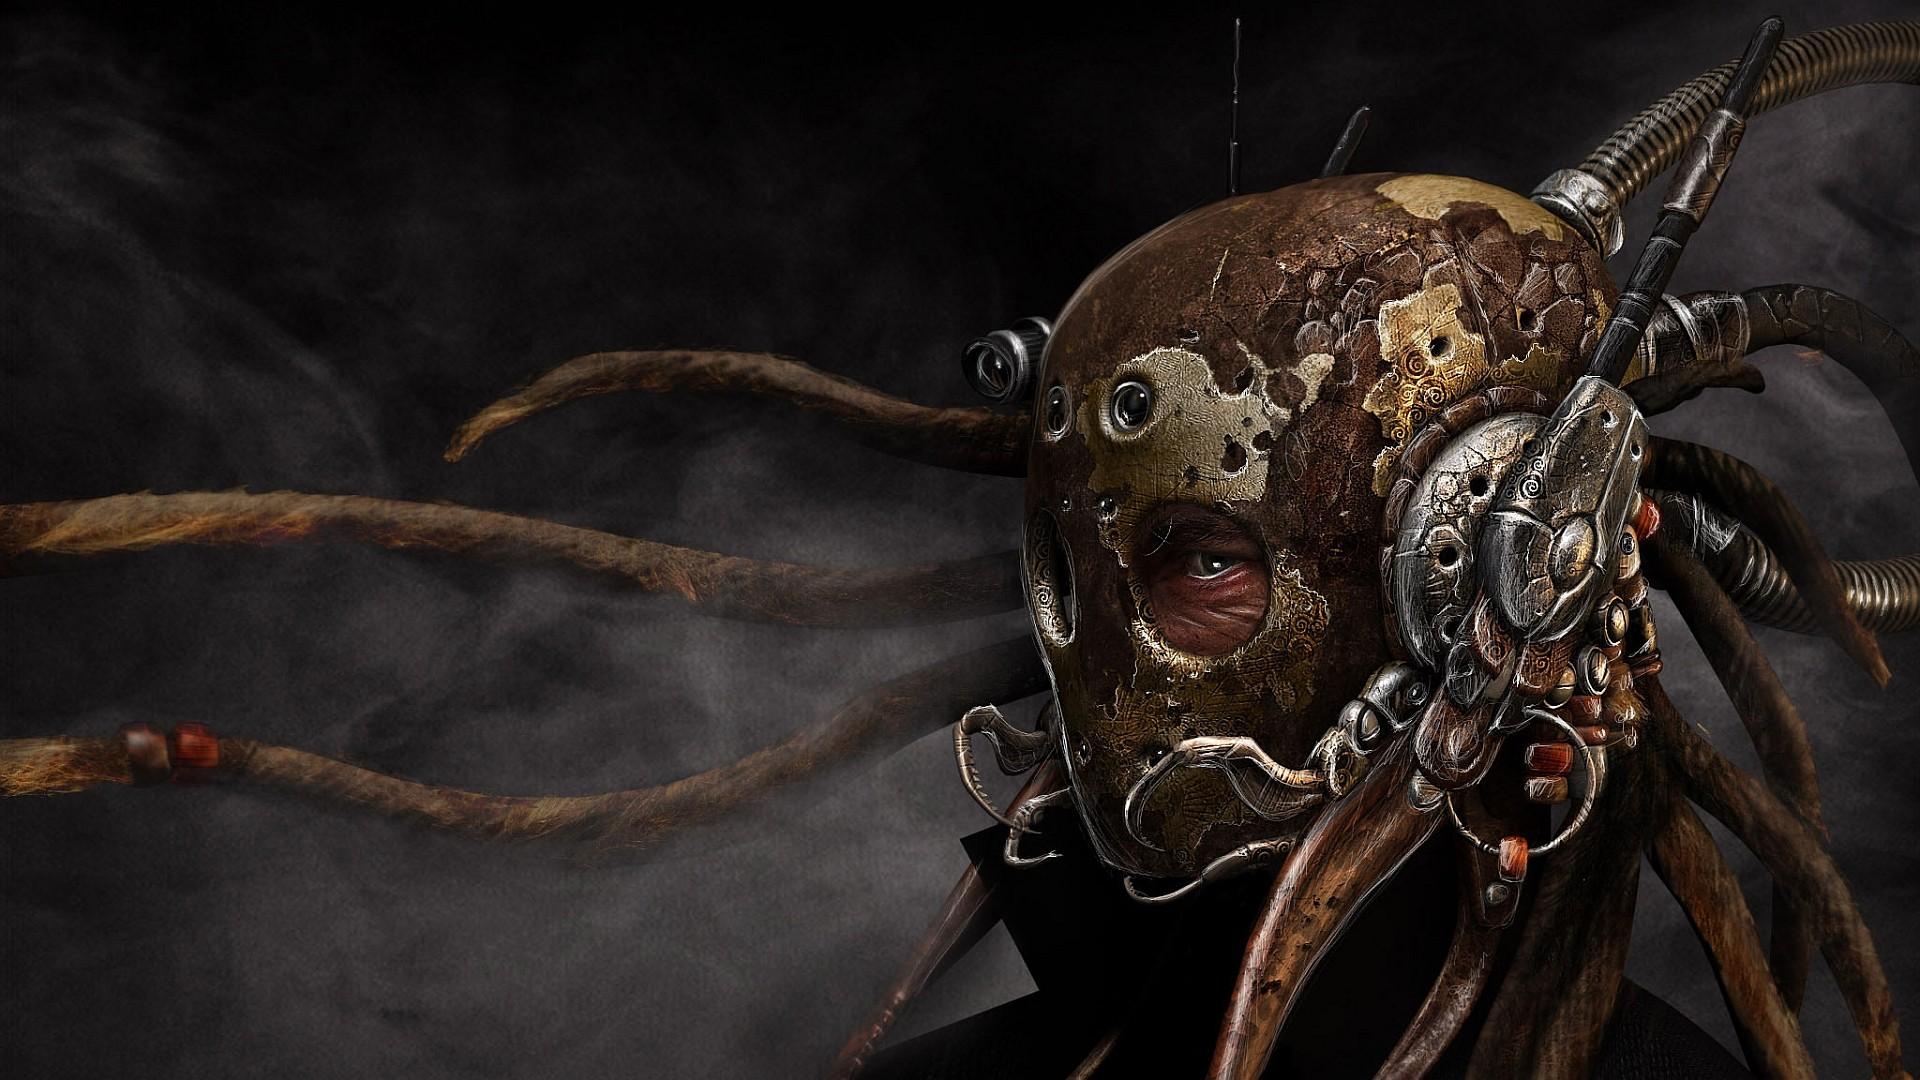 Mask Steampunk Dark Wallpaper 1920x1080 62020